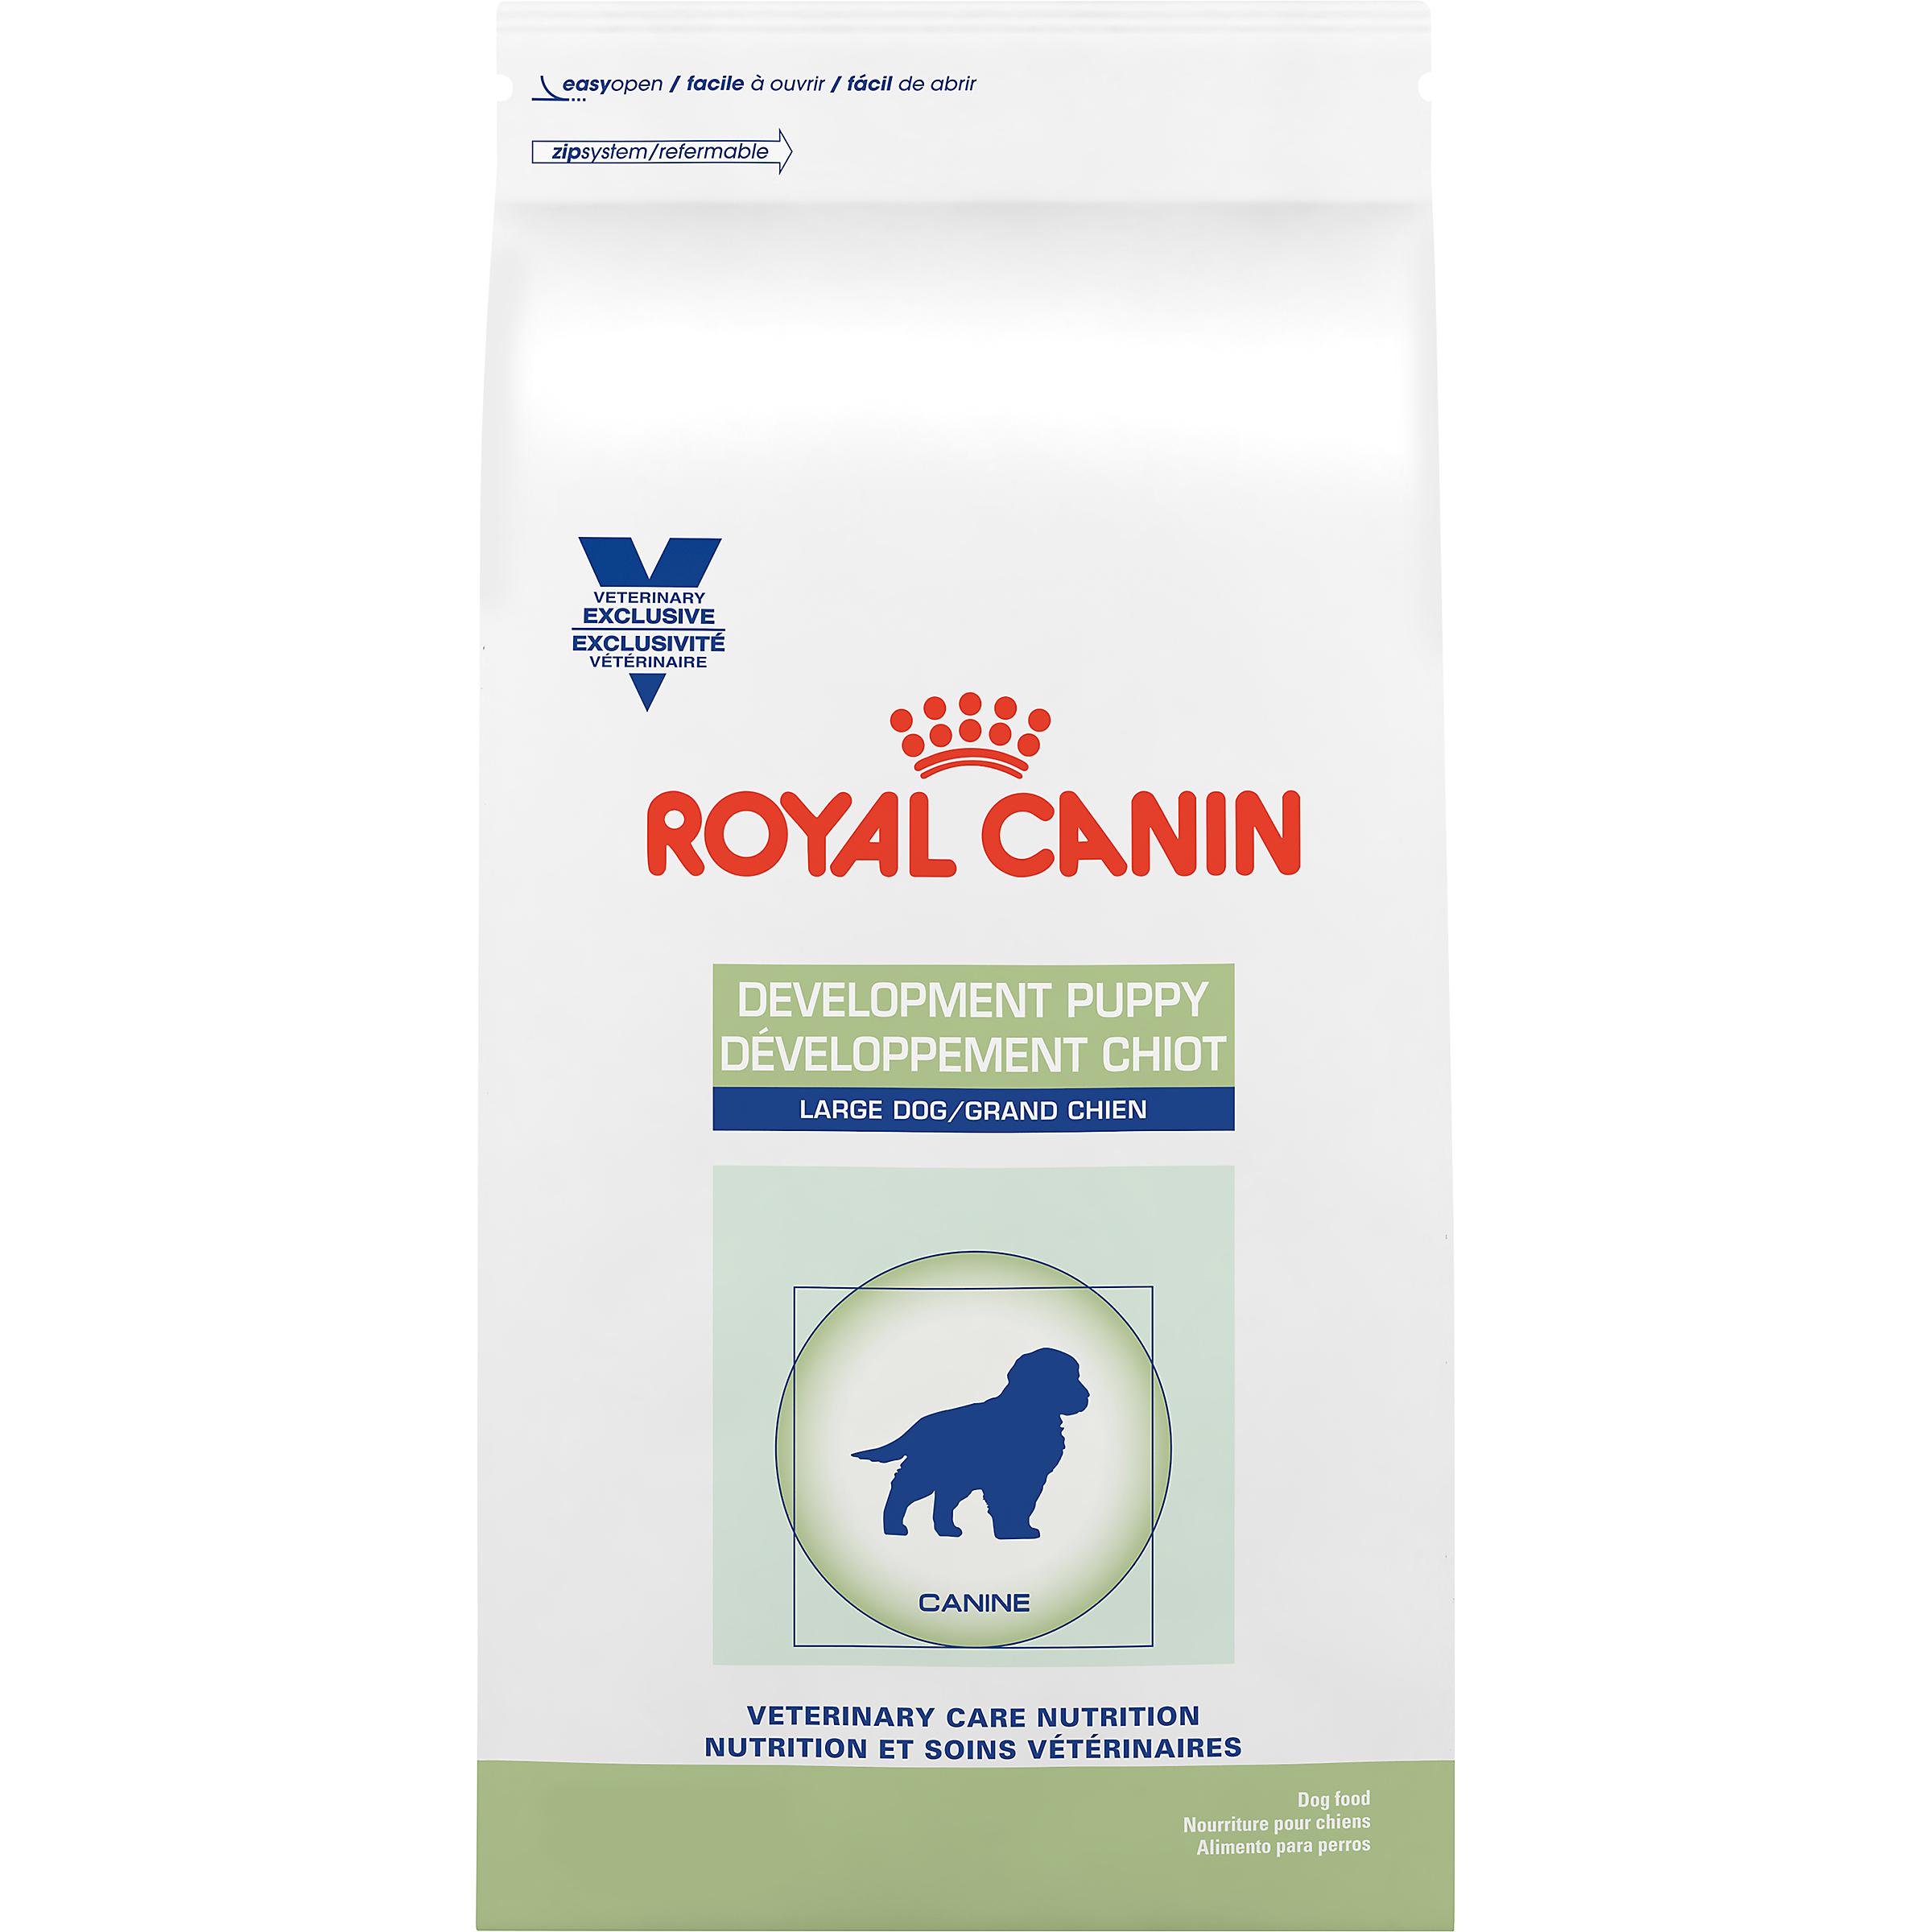 Canine Development Puppy Large Dog Dry Dog Food